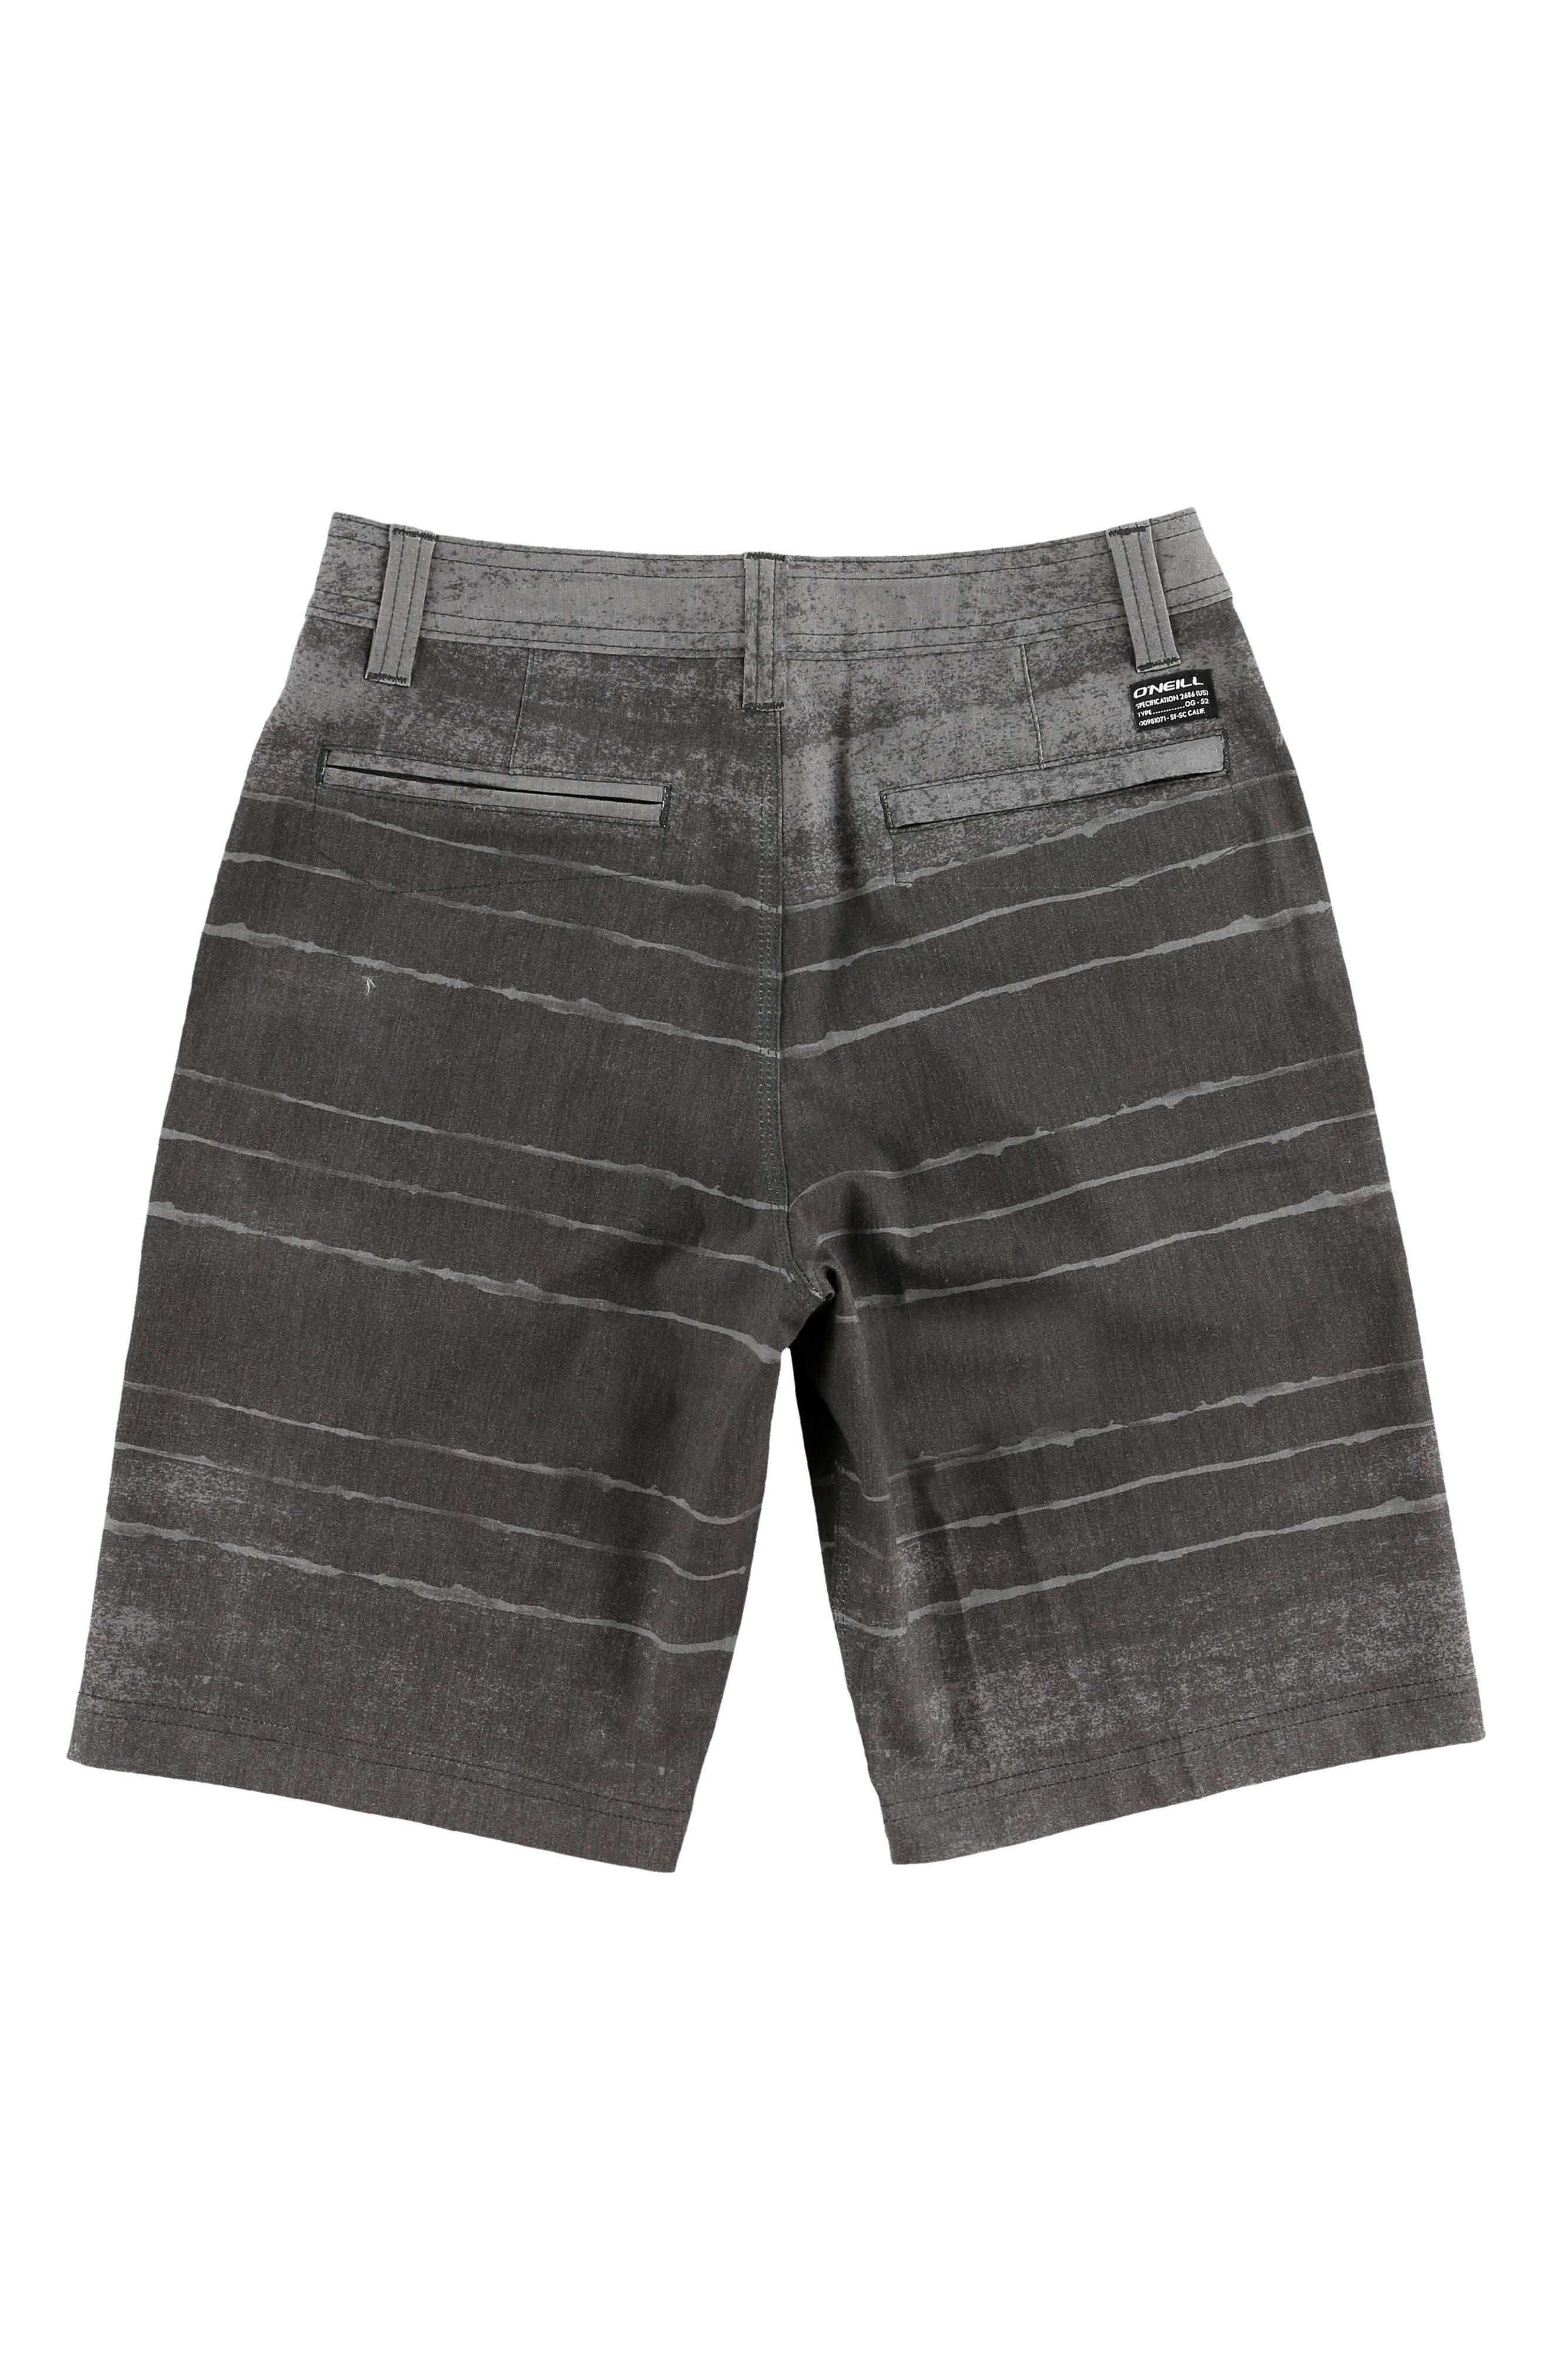 O'NEILL,                             Tye Striper Hybrid Shorts,                             Alternate thumbnail 2, color,                             ASPHALT